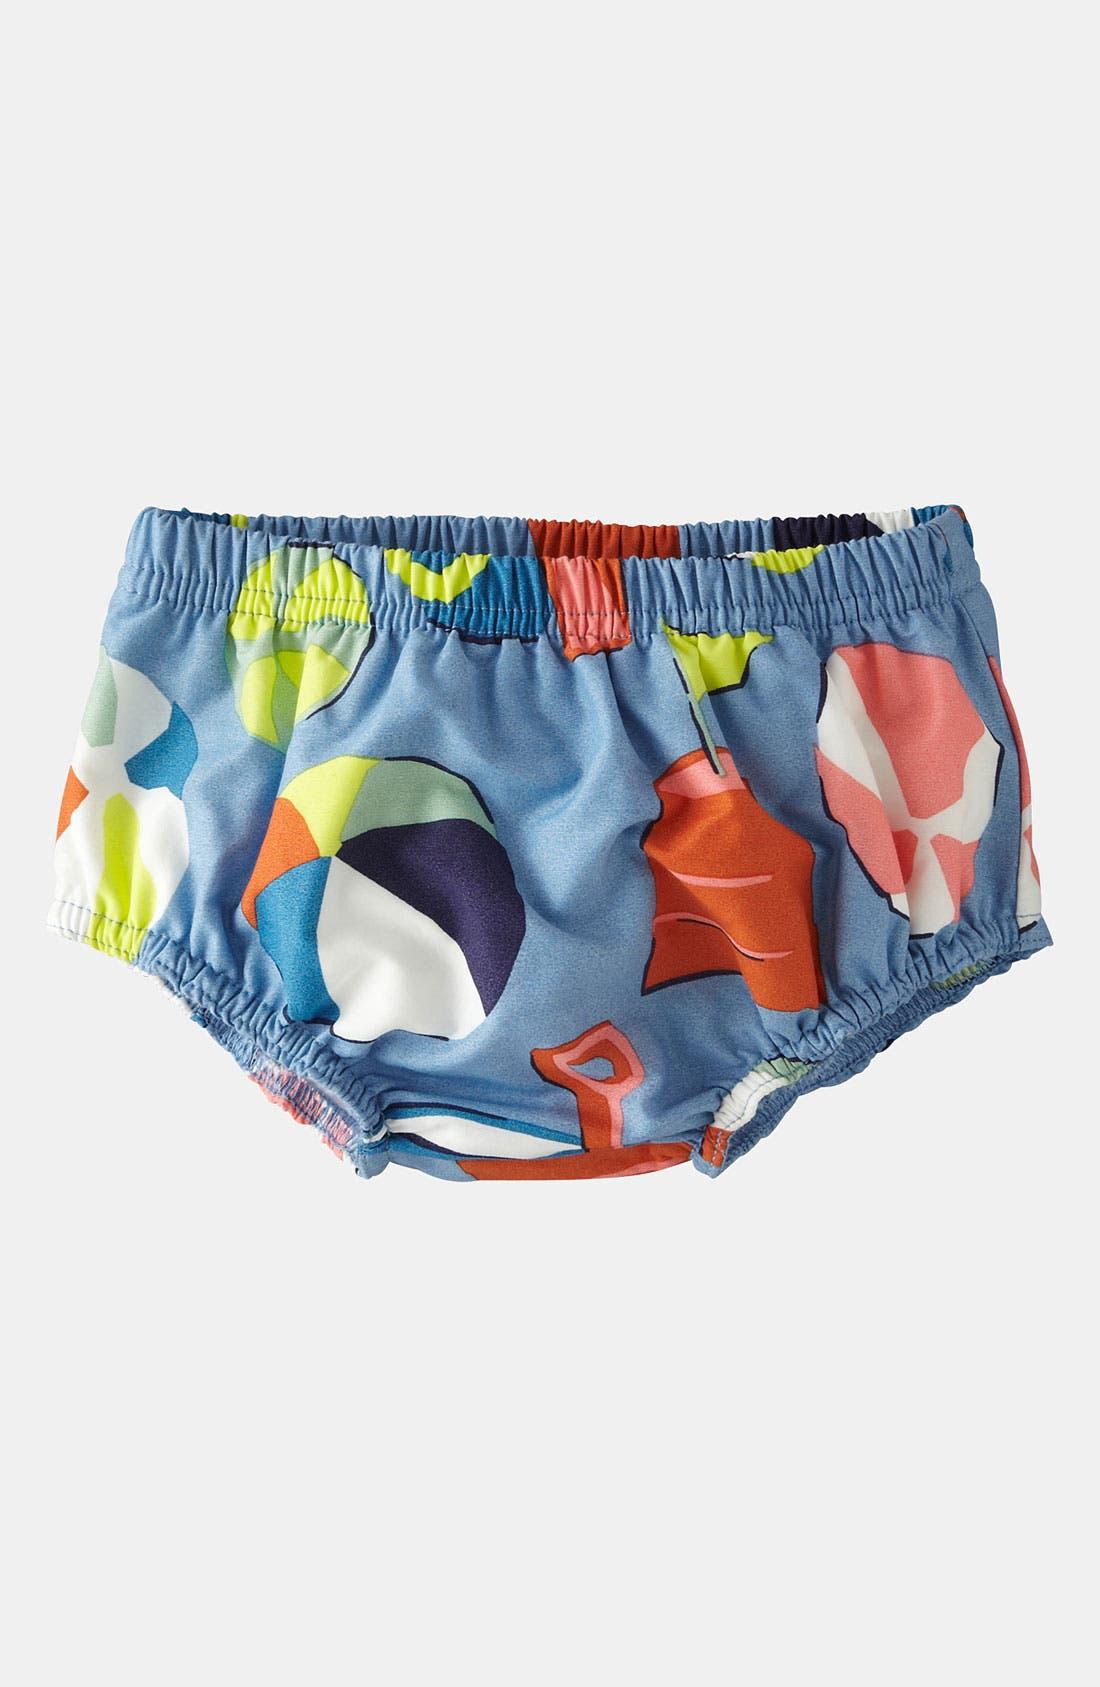 Alternate Image 1 Selected - Mini Boden Swim Pants (Baby)